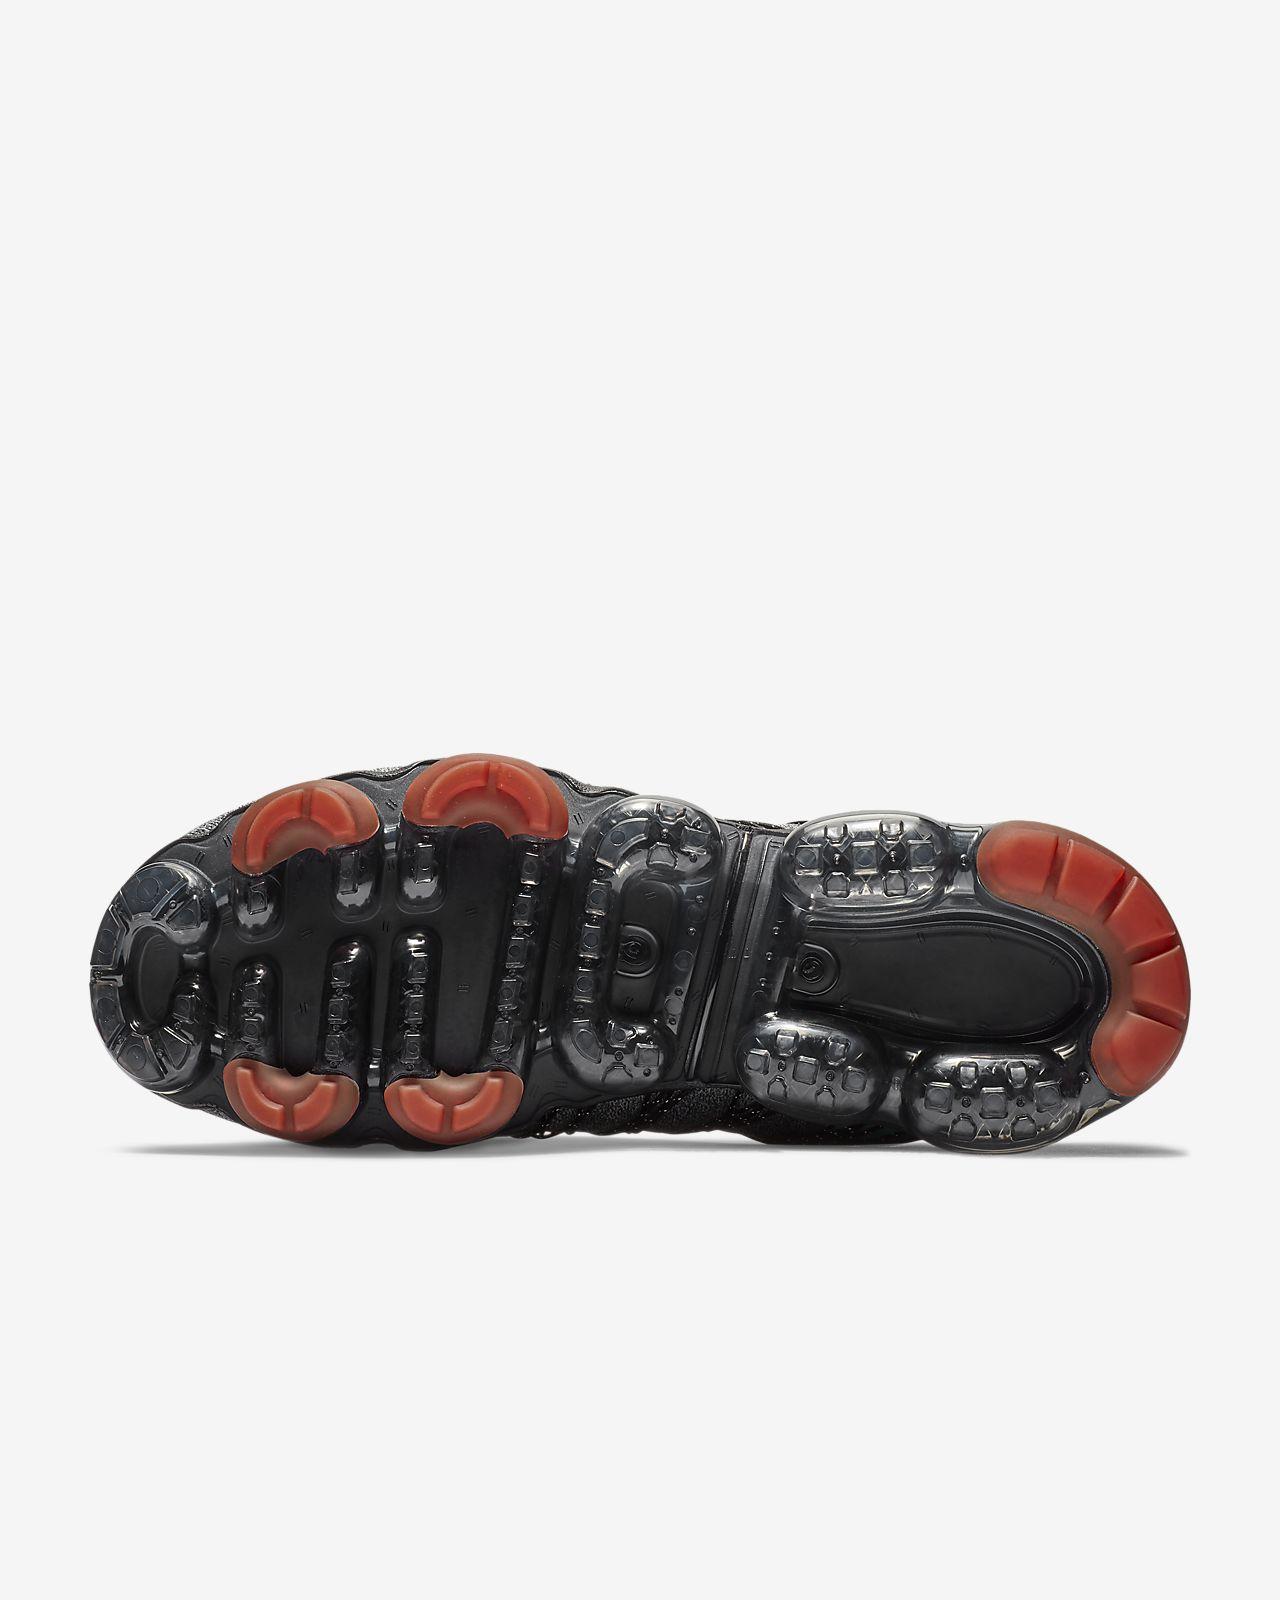 76d9677e59e6 Nike Air VaporMax Utility Men s Shoe. Nike.com AU